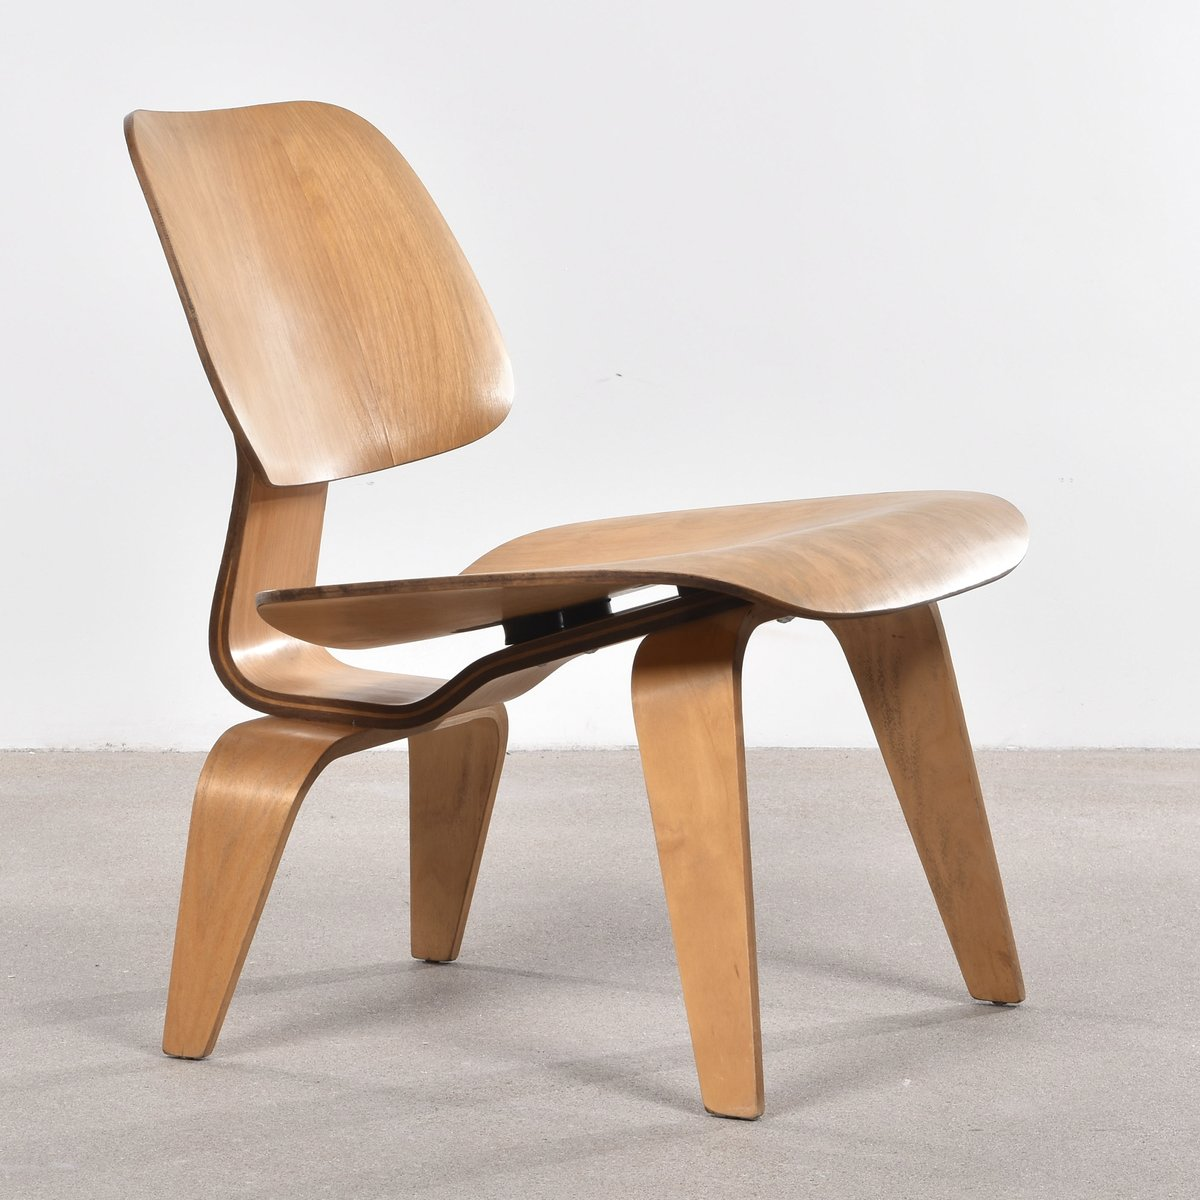 Molto Sedia LCW in quercia di Charles & Ray Eames per Herman Miller  GW92